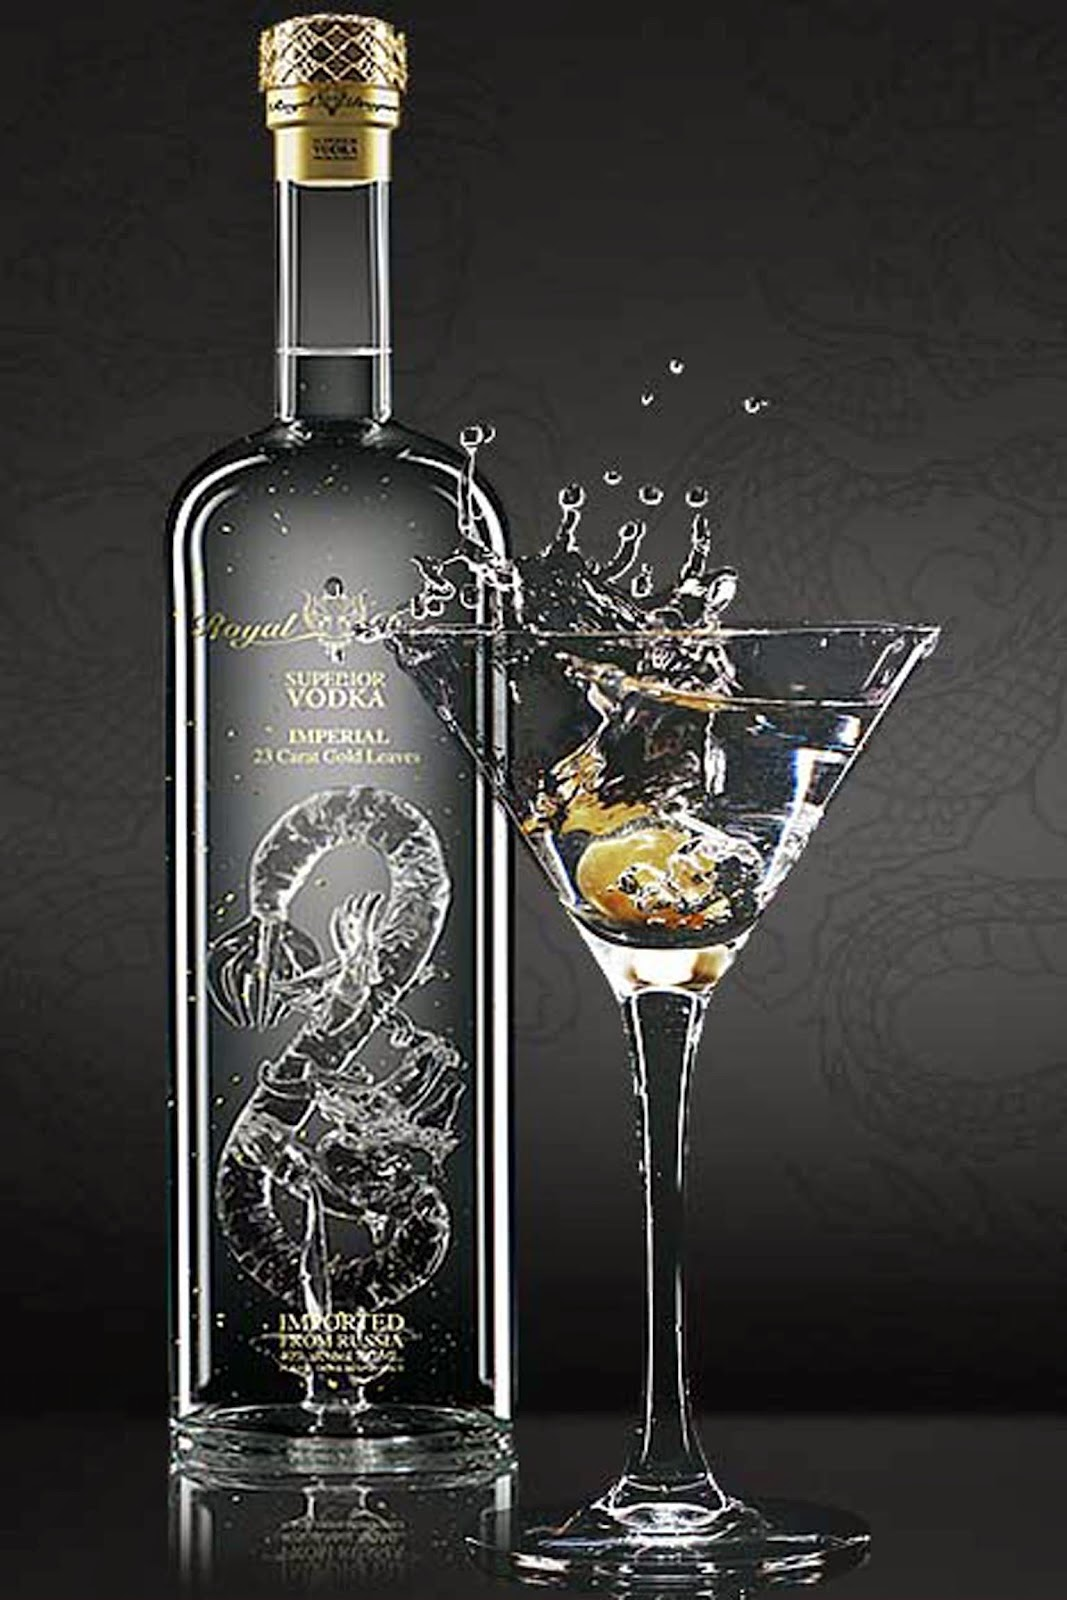 dragone vodka oriente nero black bottiglia packaging naming design ricerca nome